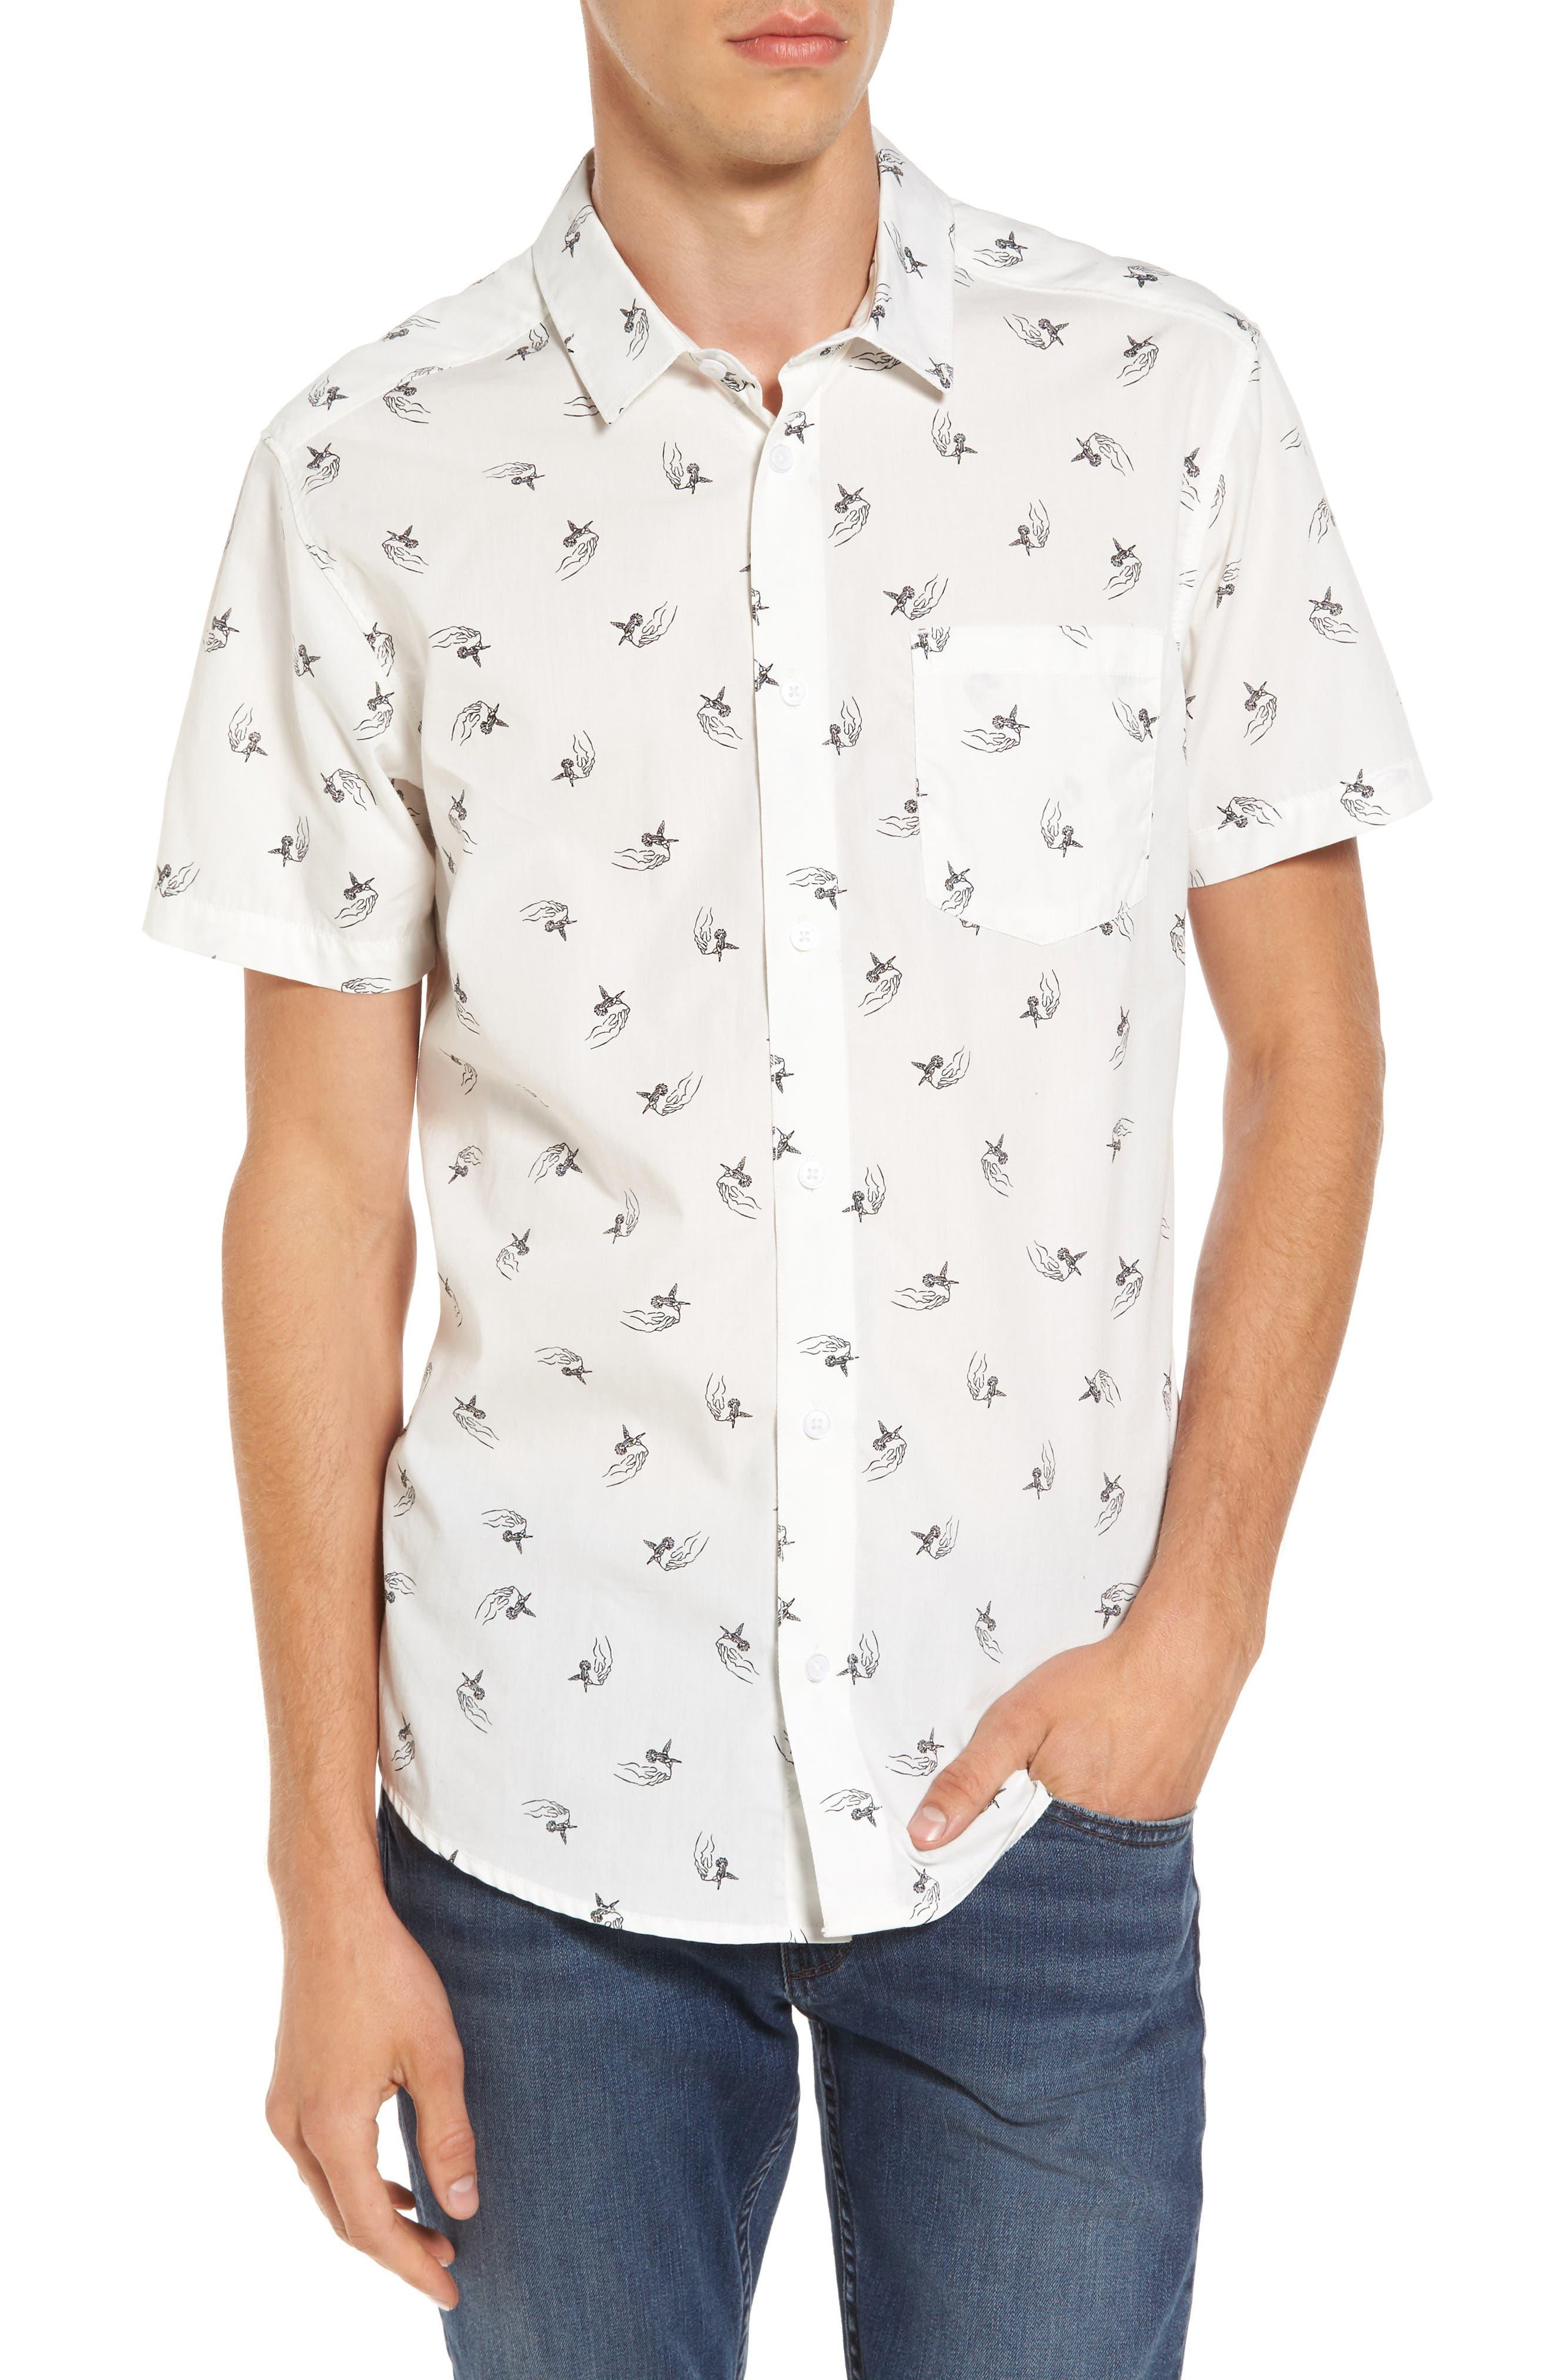 x Kevin Long Hummingbird Woven Shirt,                             Main thumbnail 1, color,                             Antique White